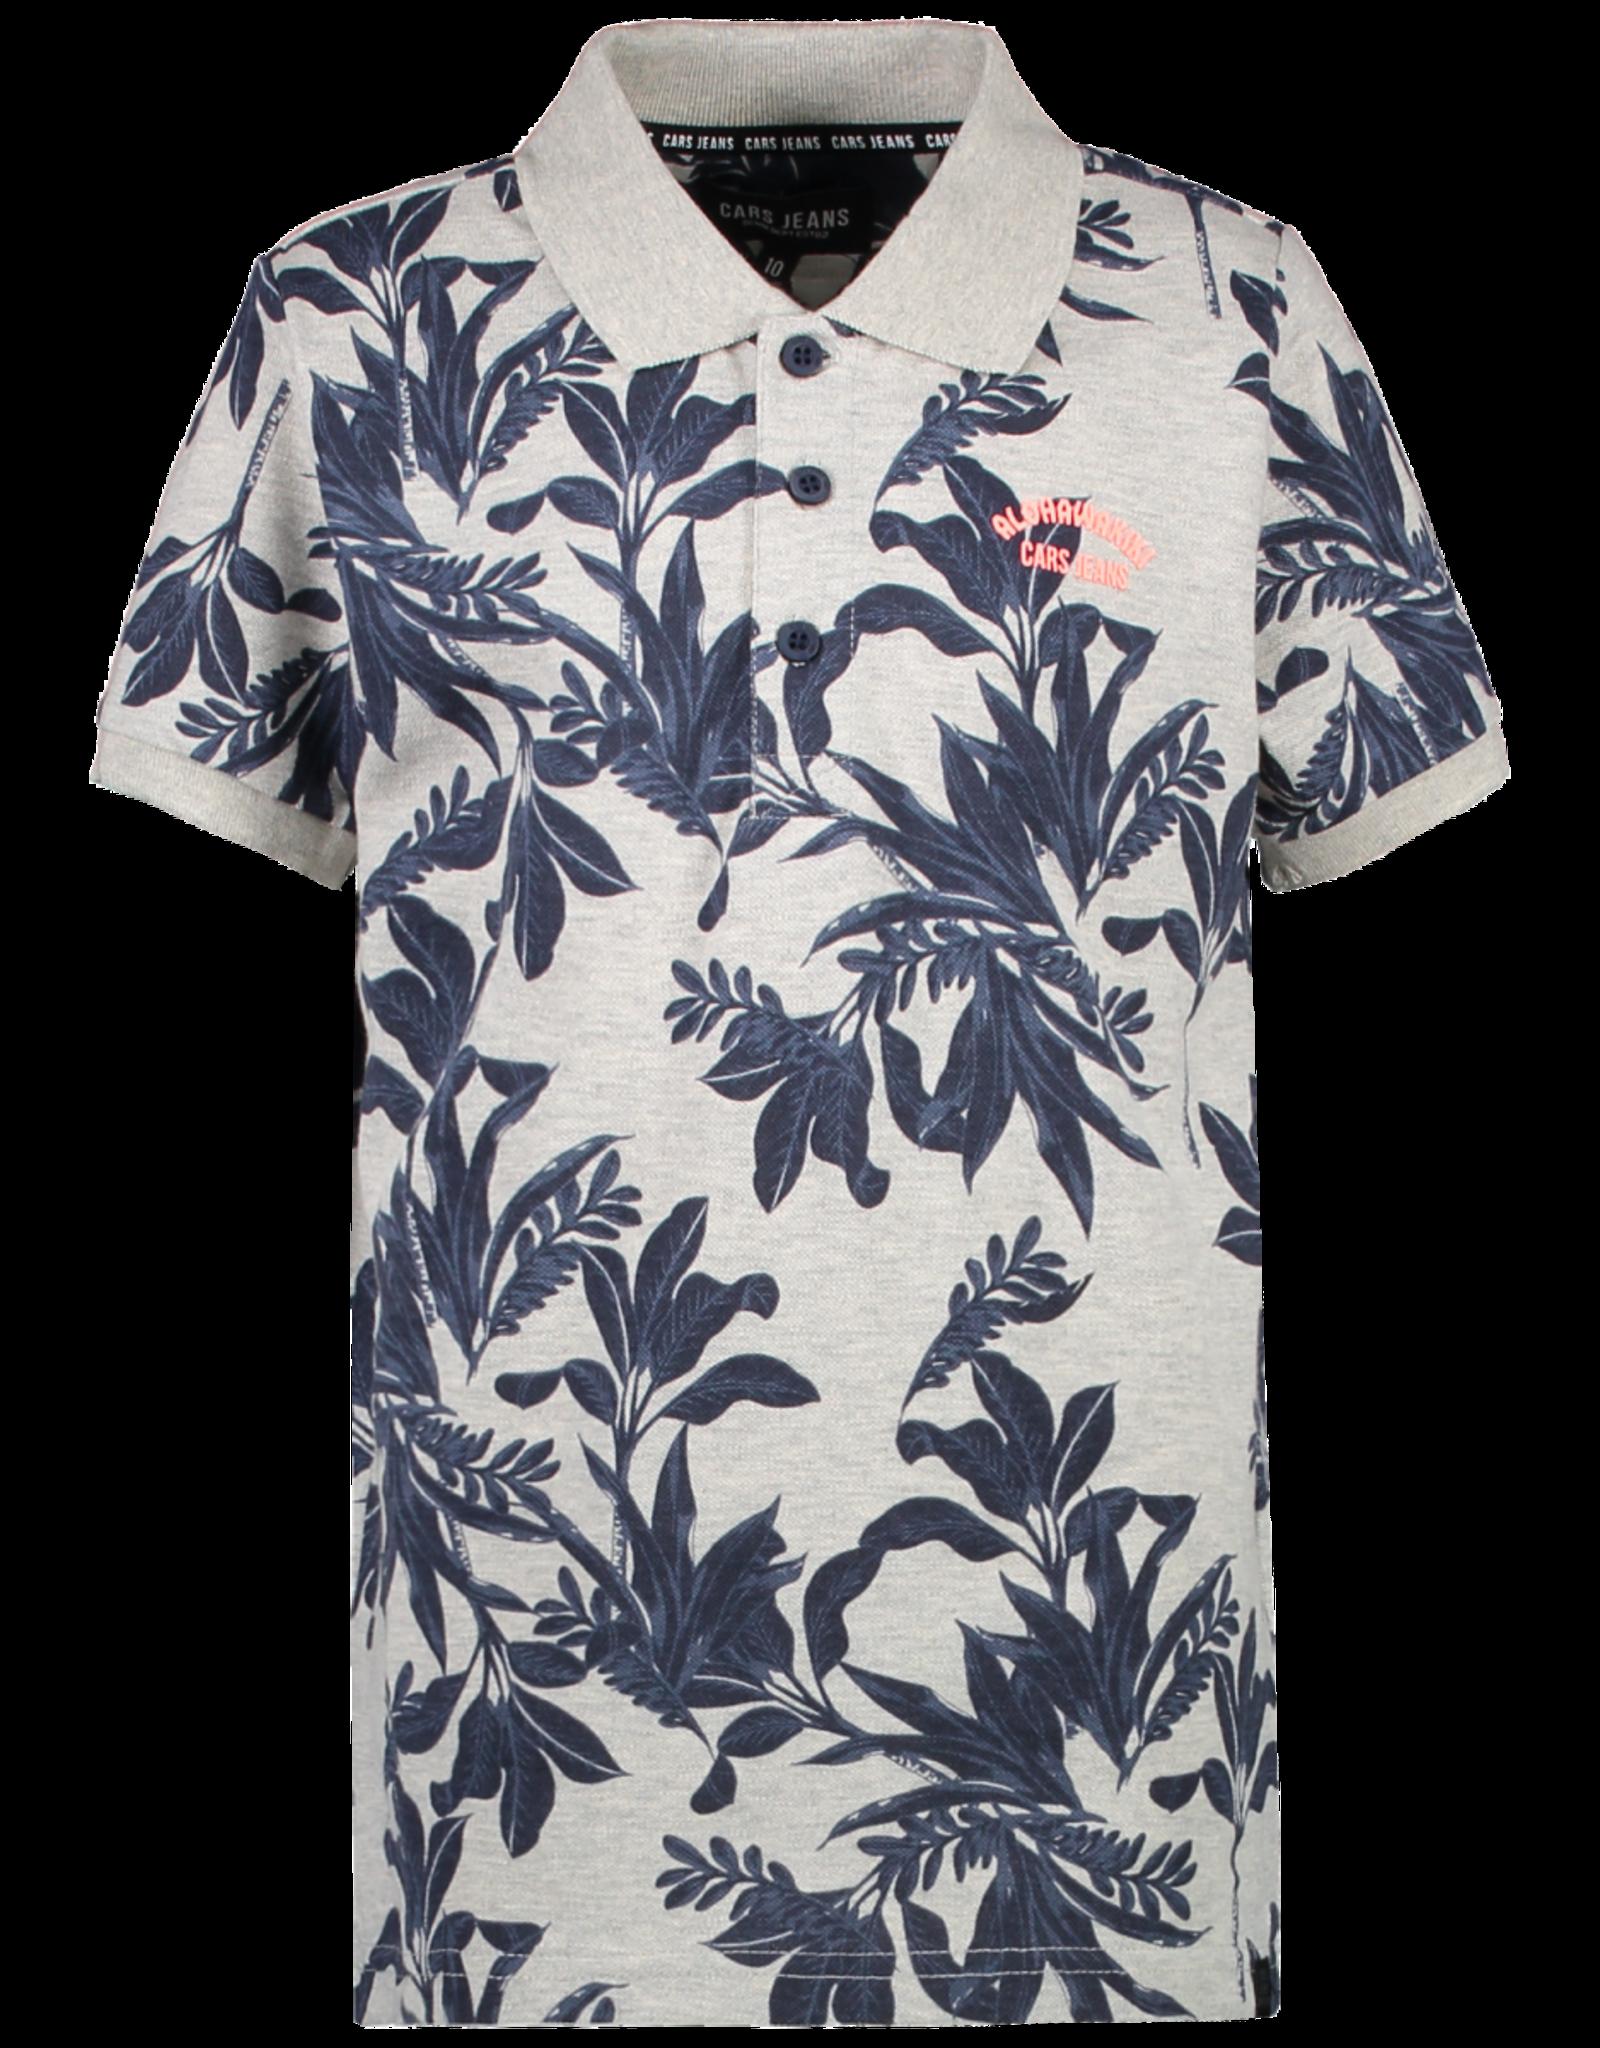 Cars Cars Richie grijs polo t-shirt met navy plantenprint